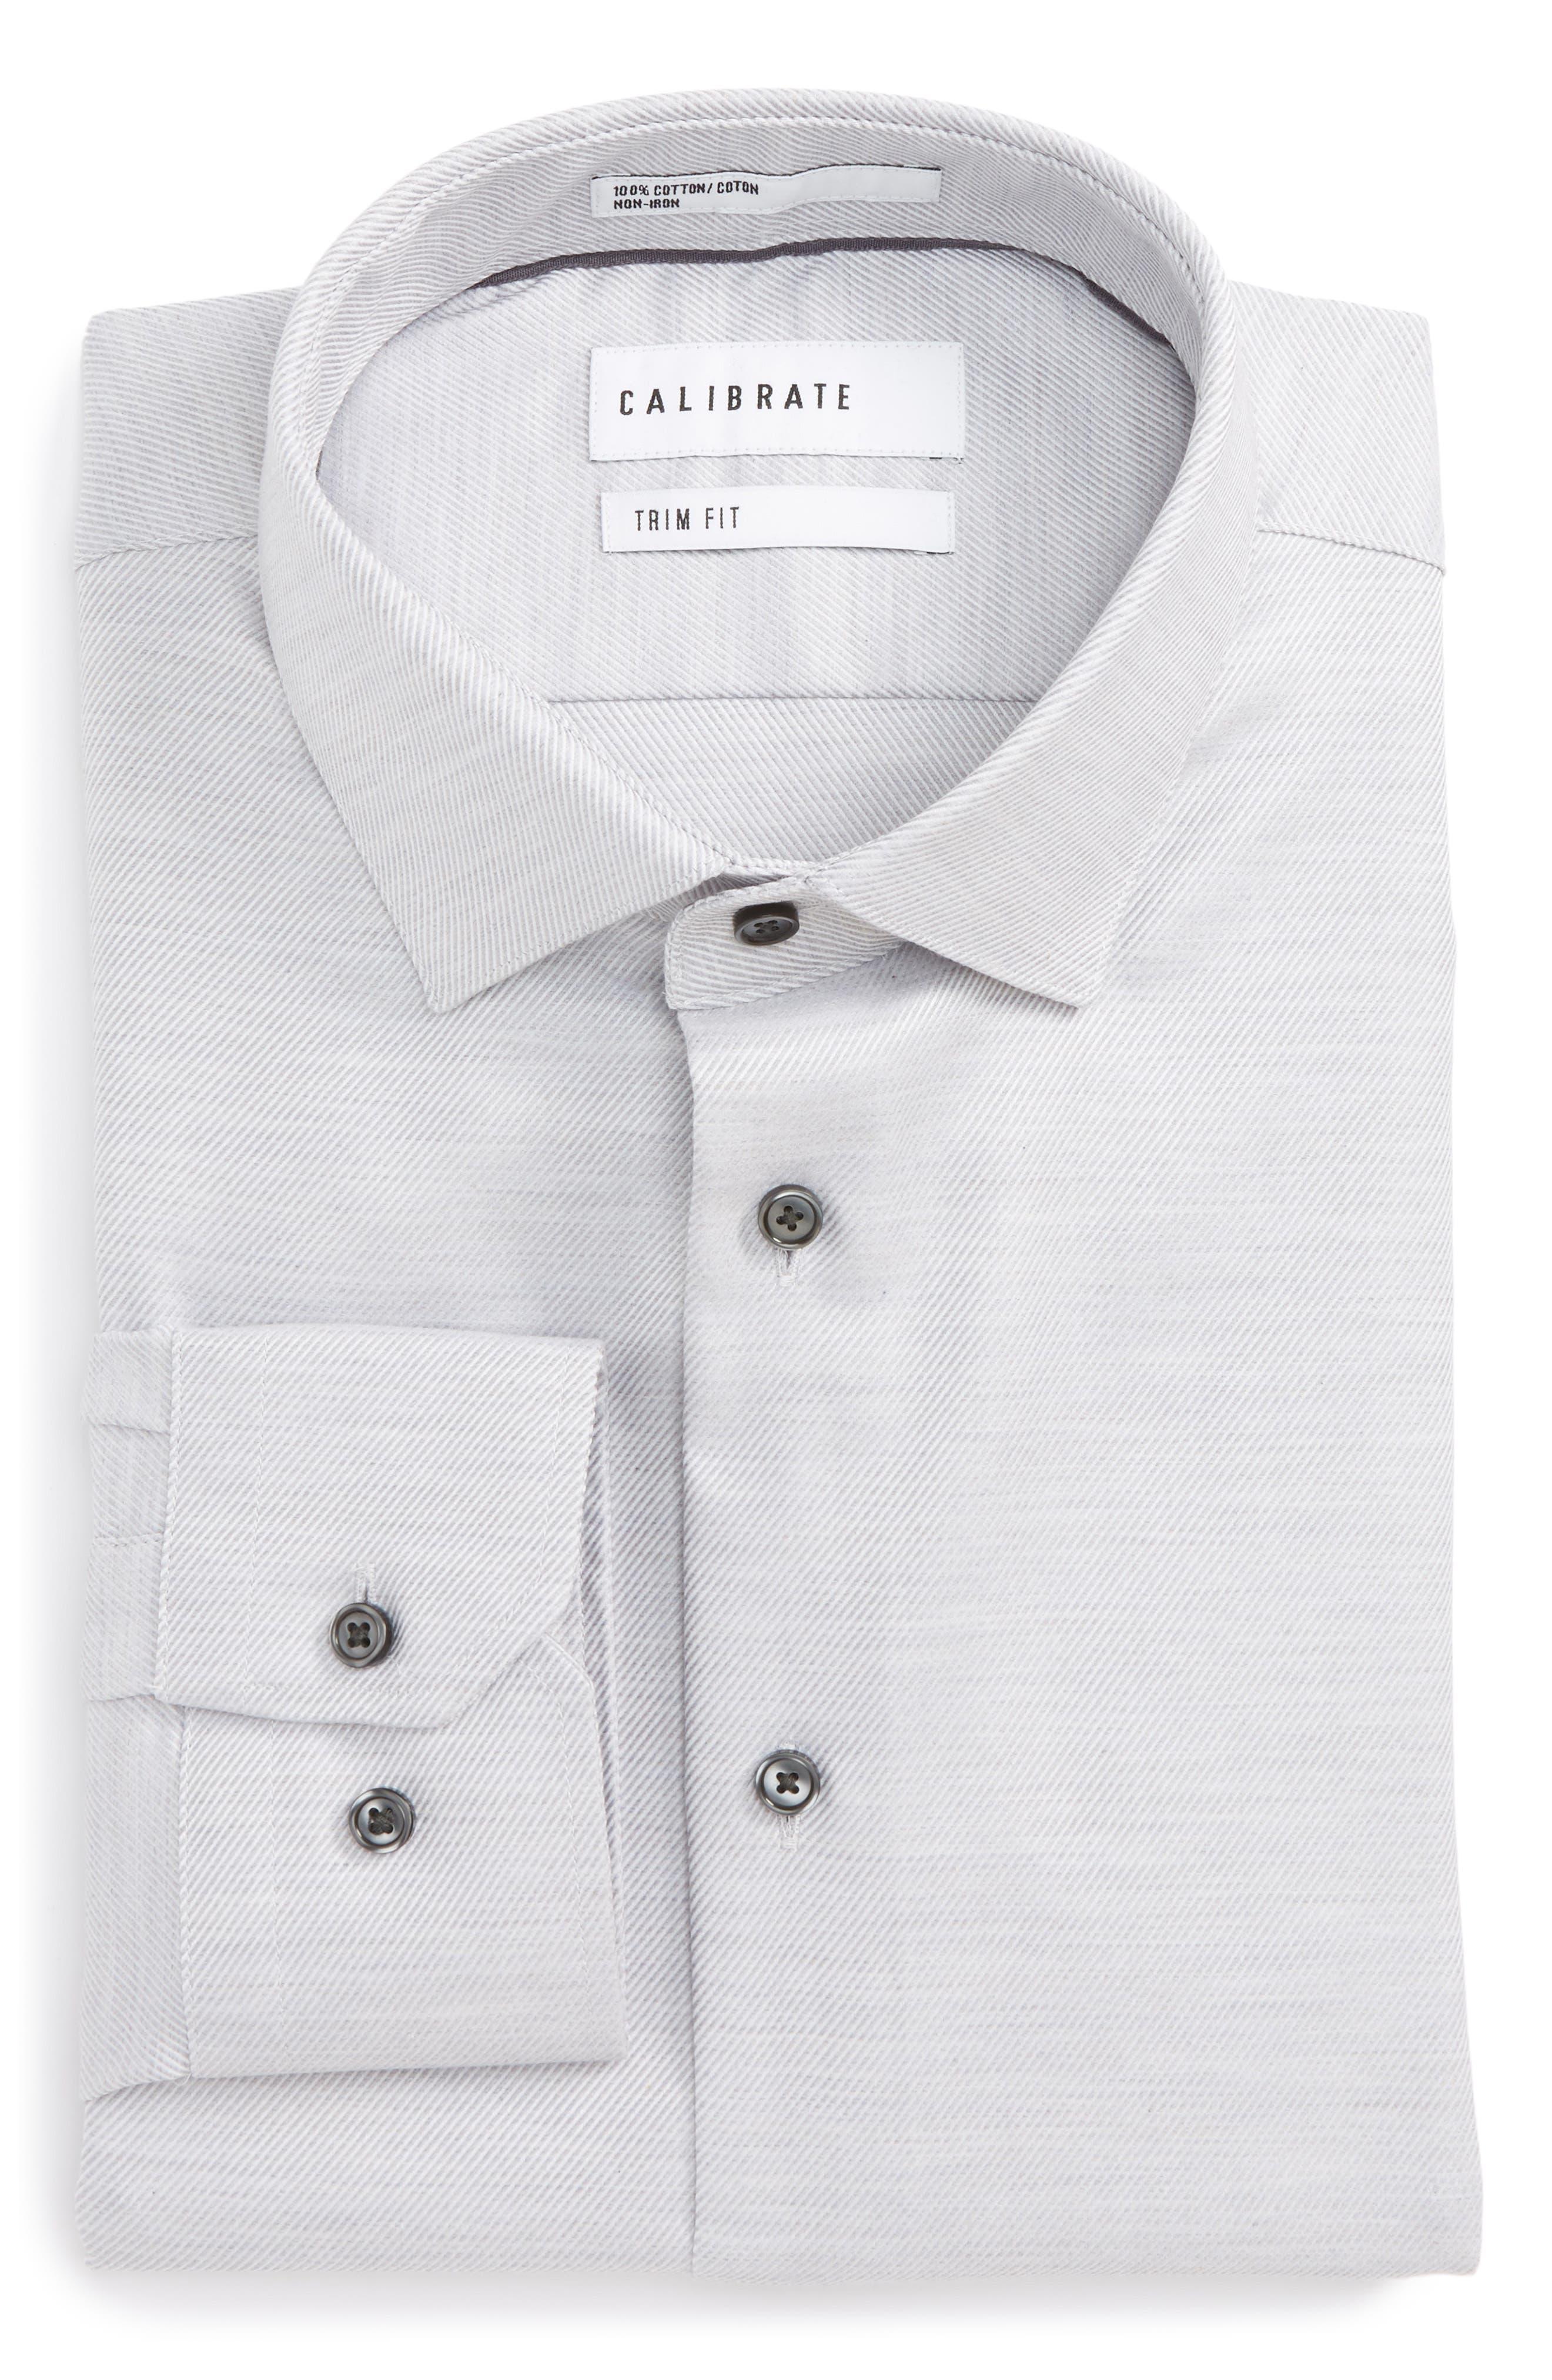 Alternate Image 1 Selected - Calibrate Trim Fit Twill Dress Shirt